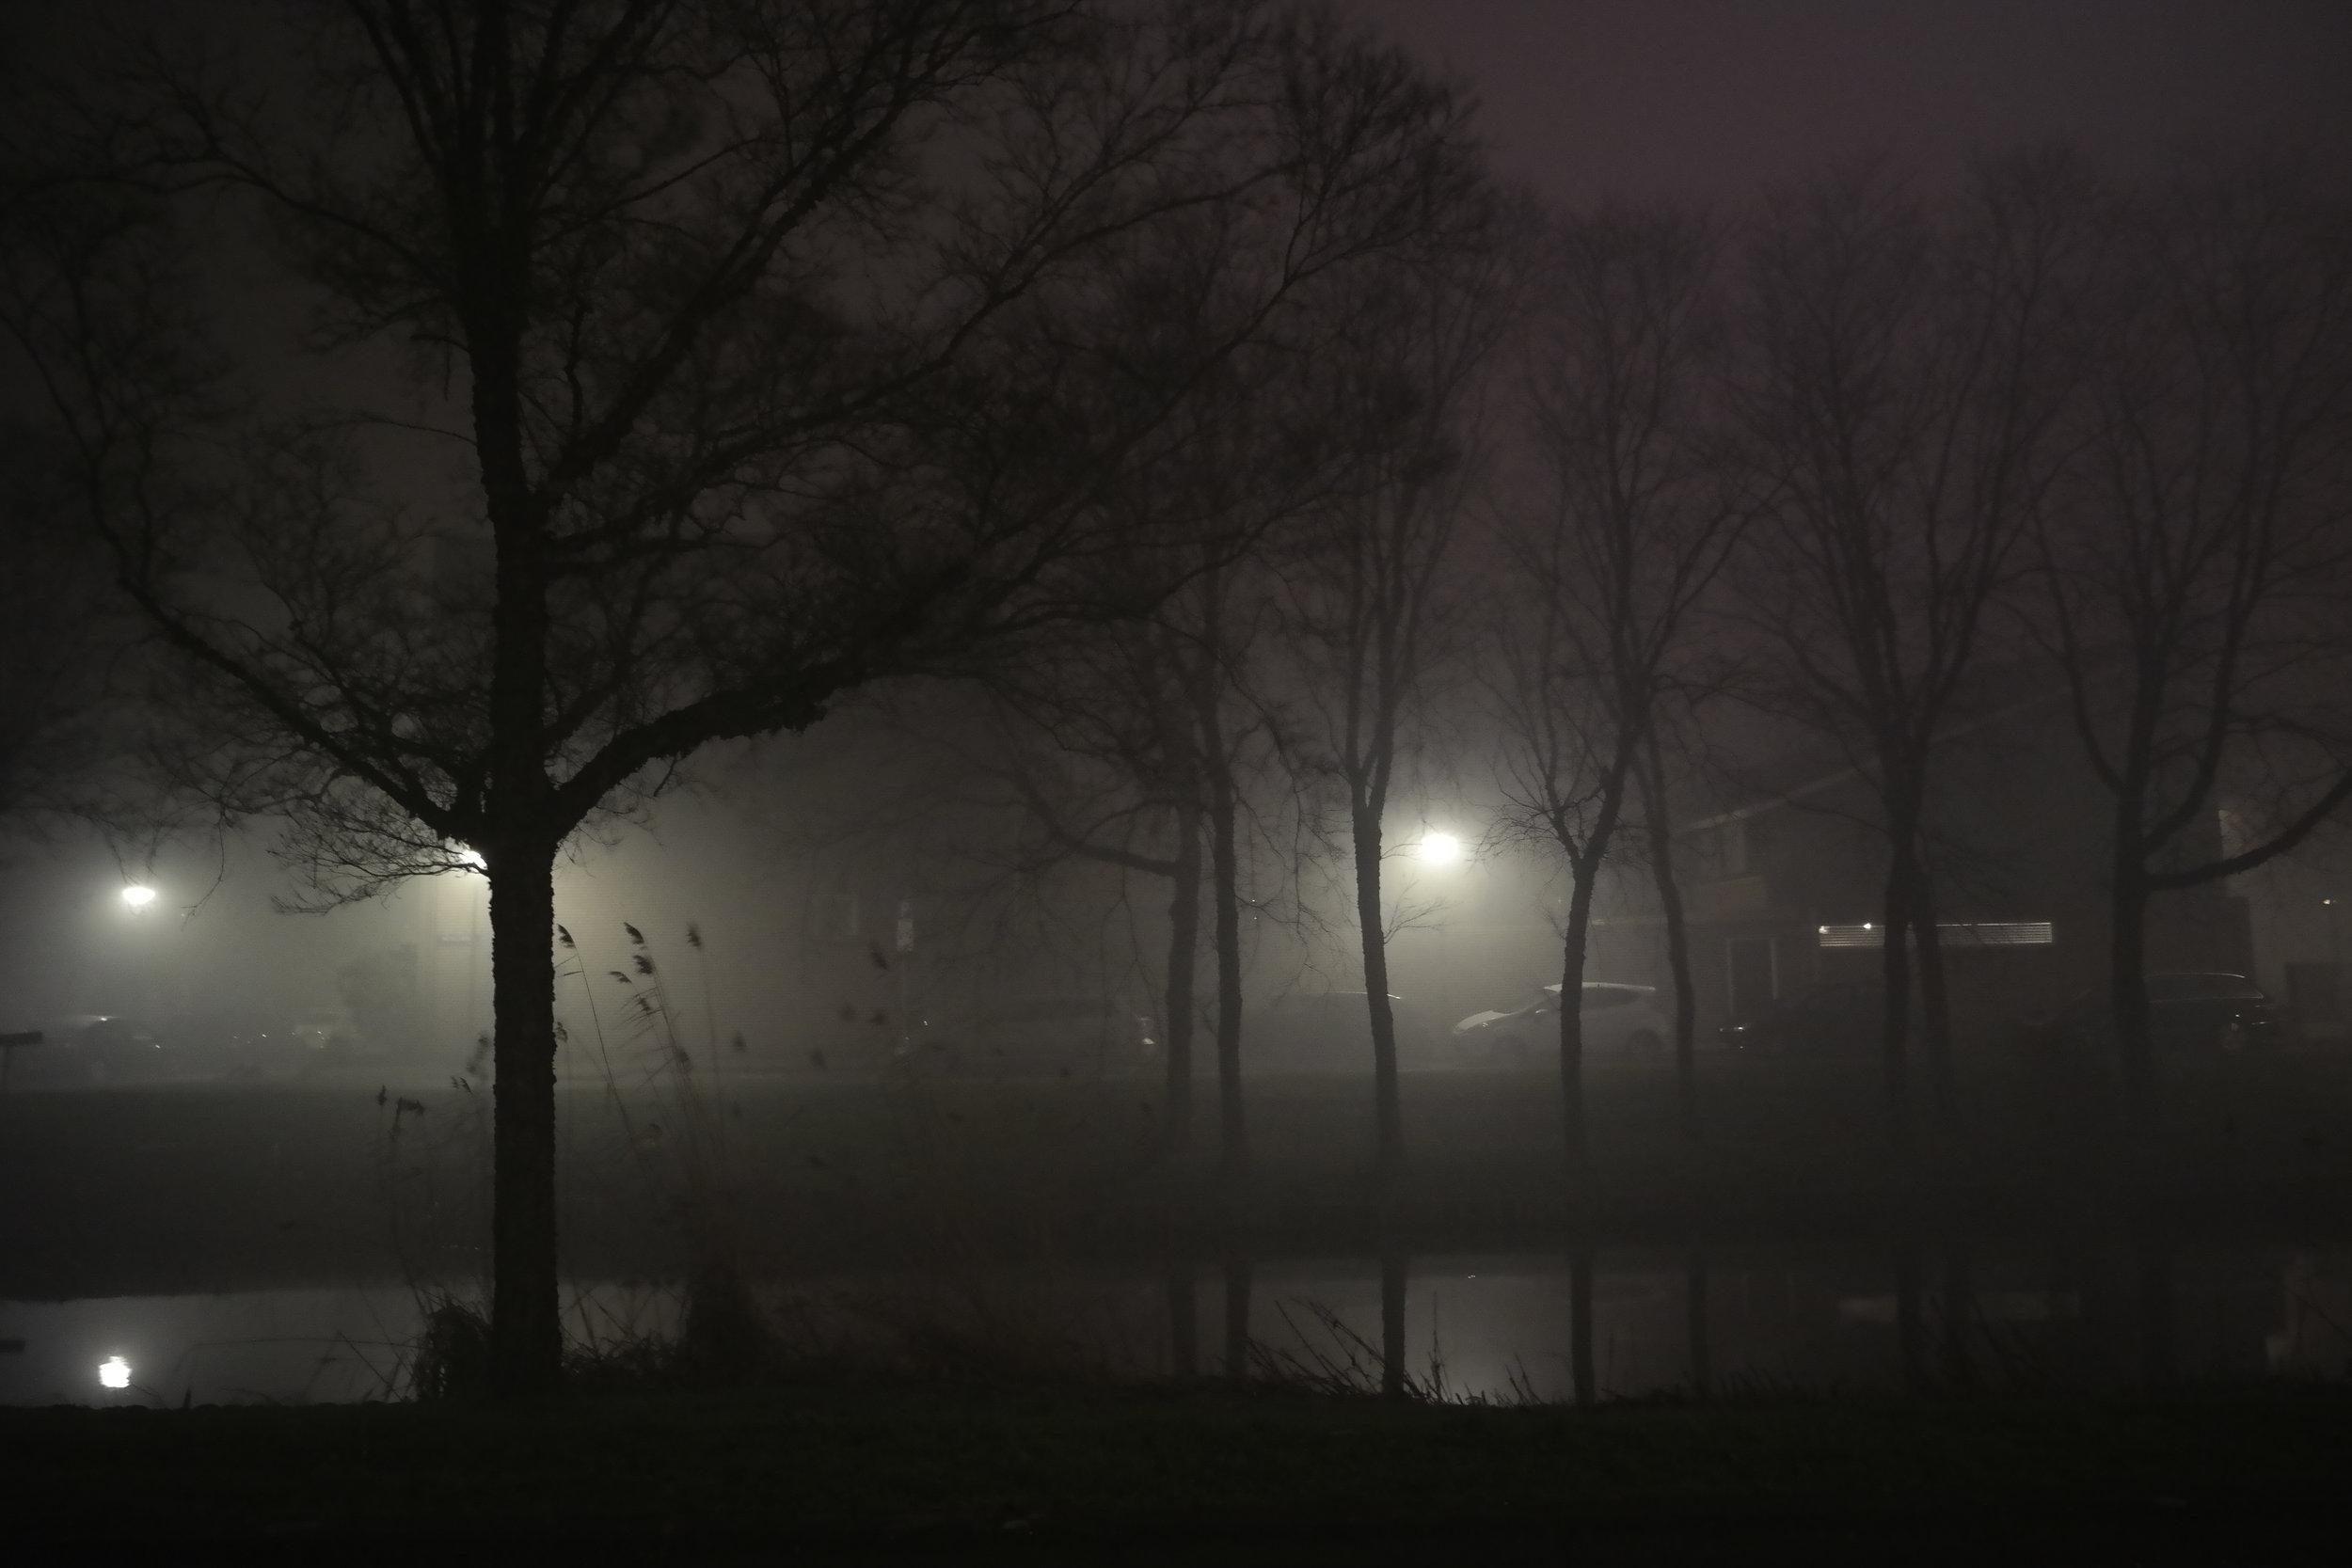 Mystic-fog-New-Years-lights-Amsterdam.jpg